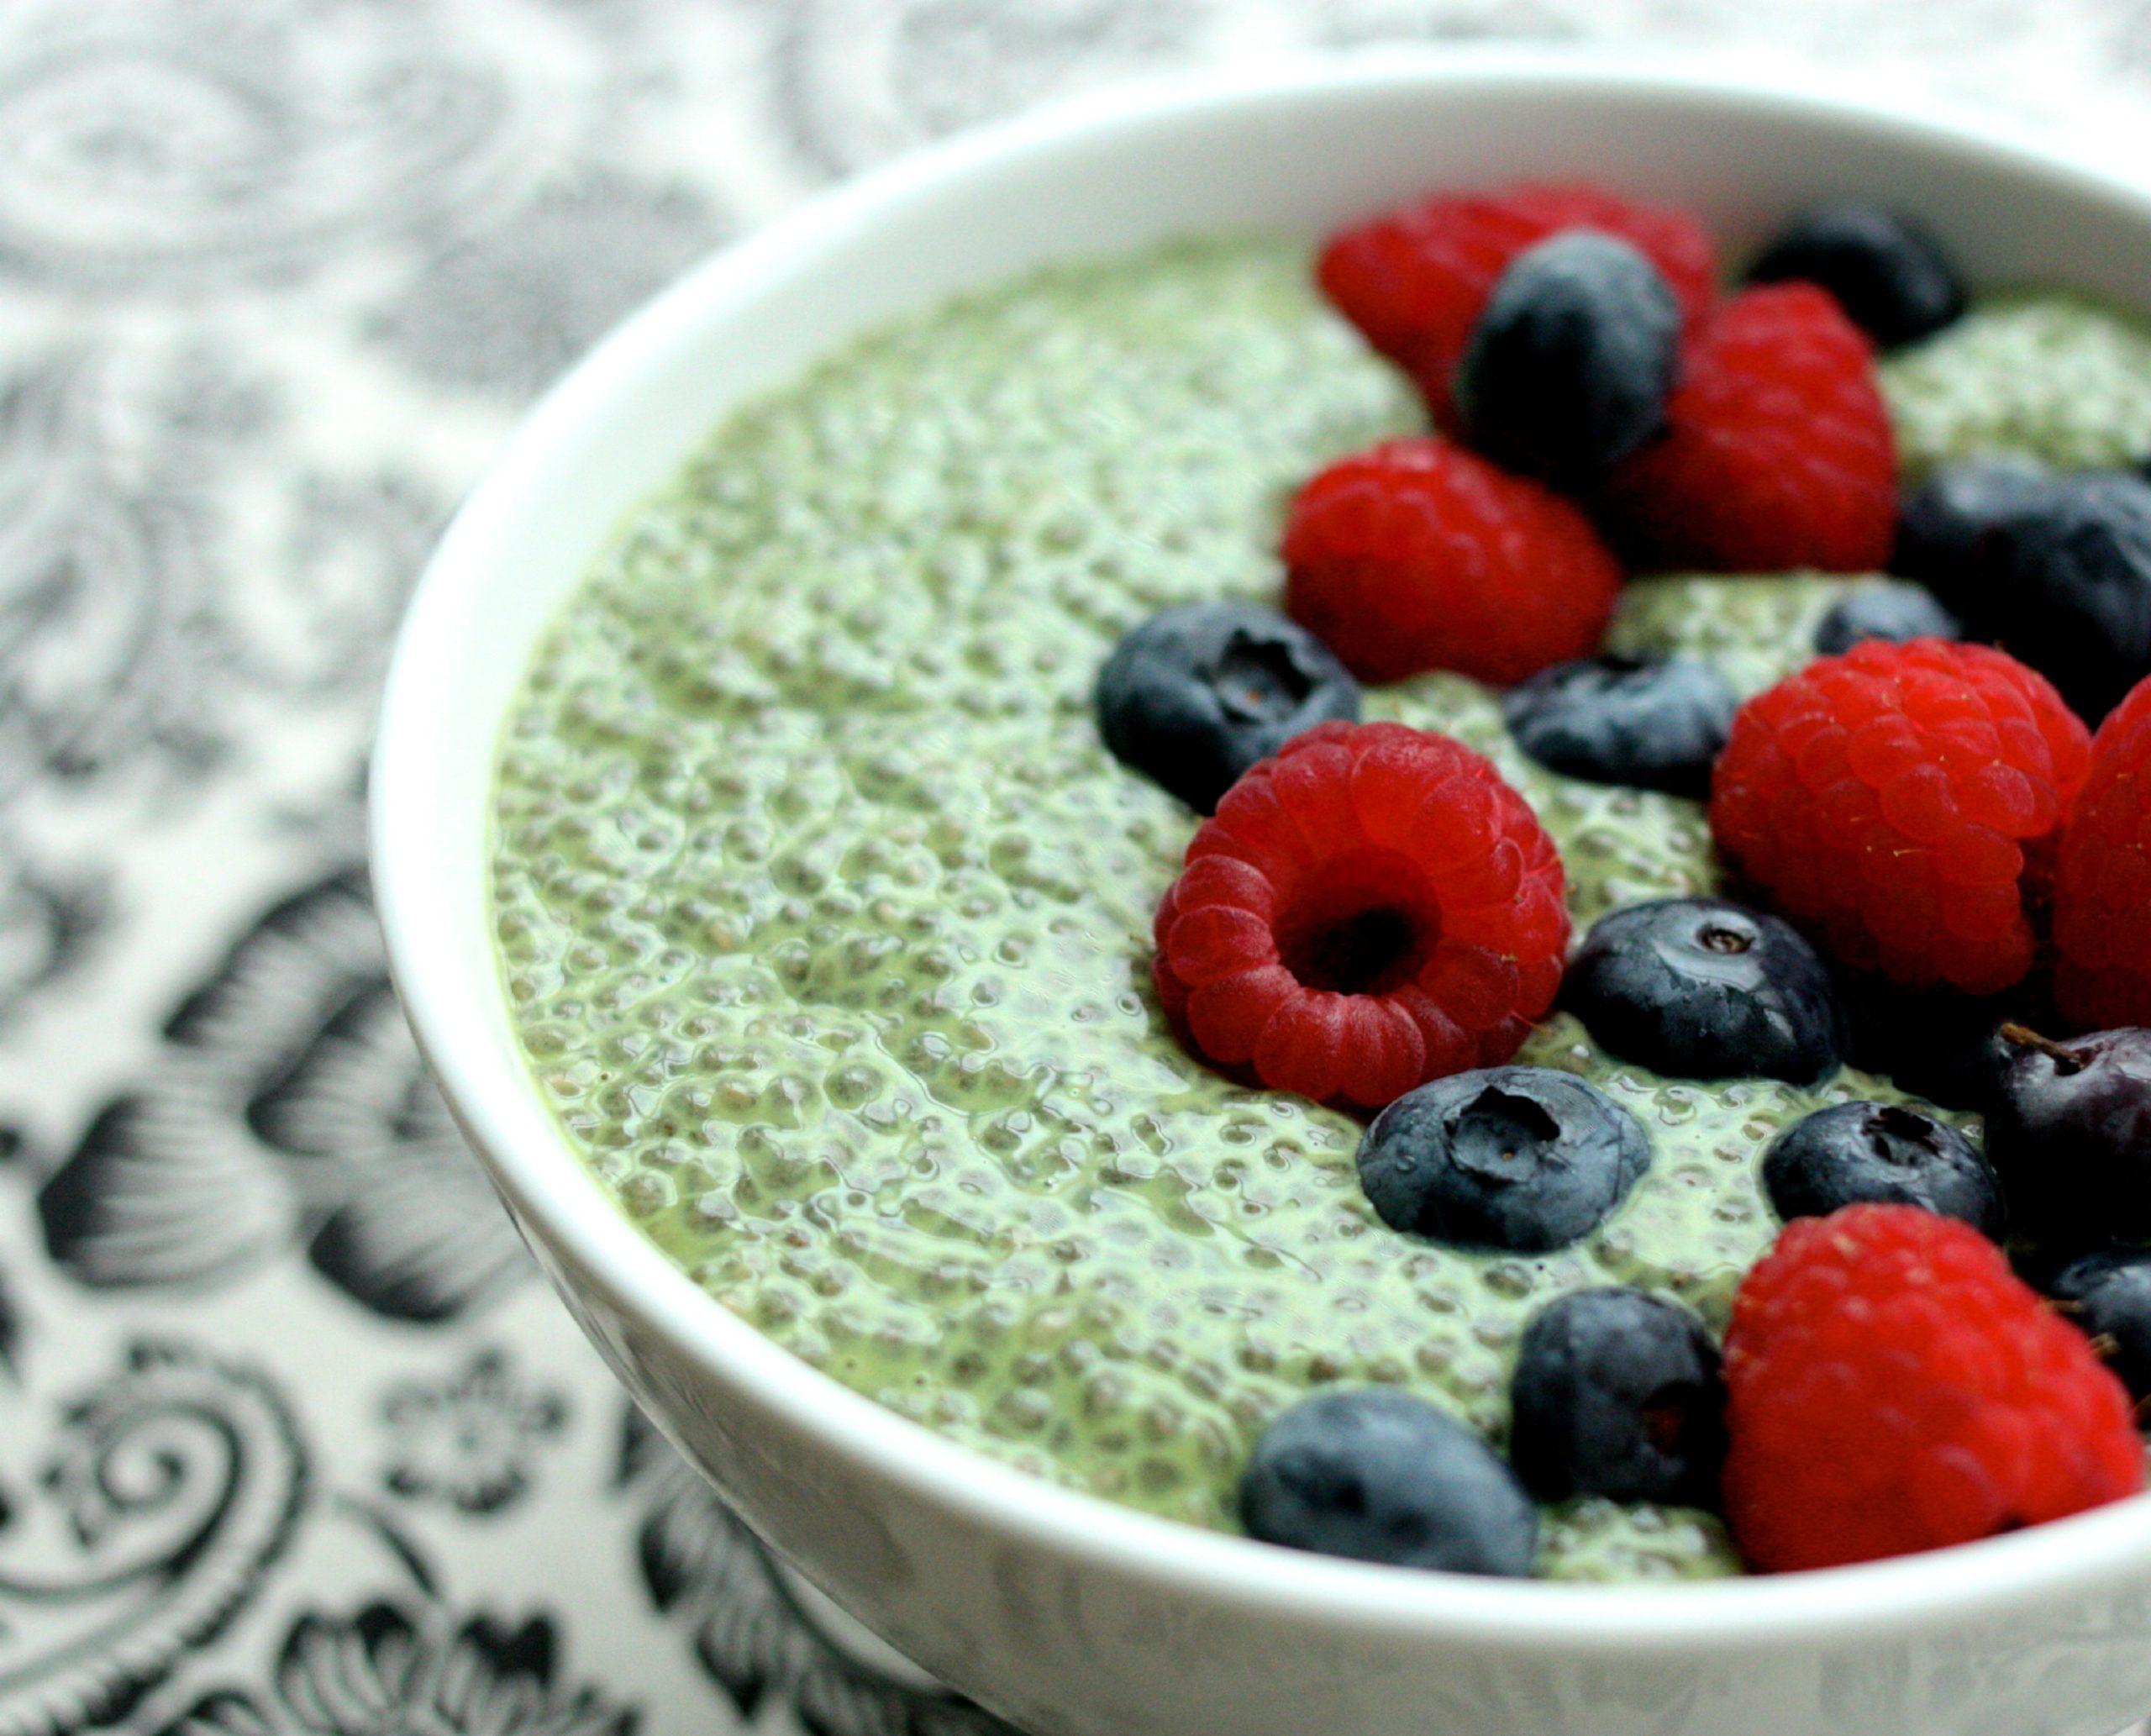 Watch How to Make Matcha Green Tea Chia Pudding video